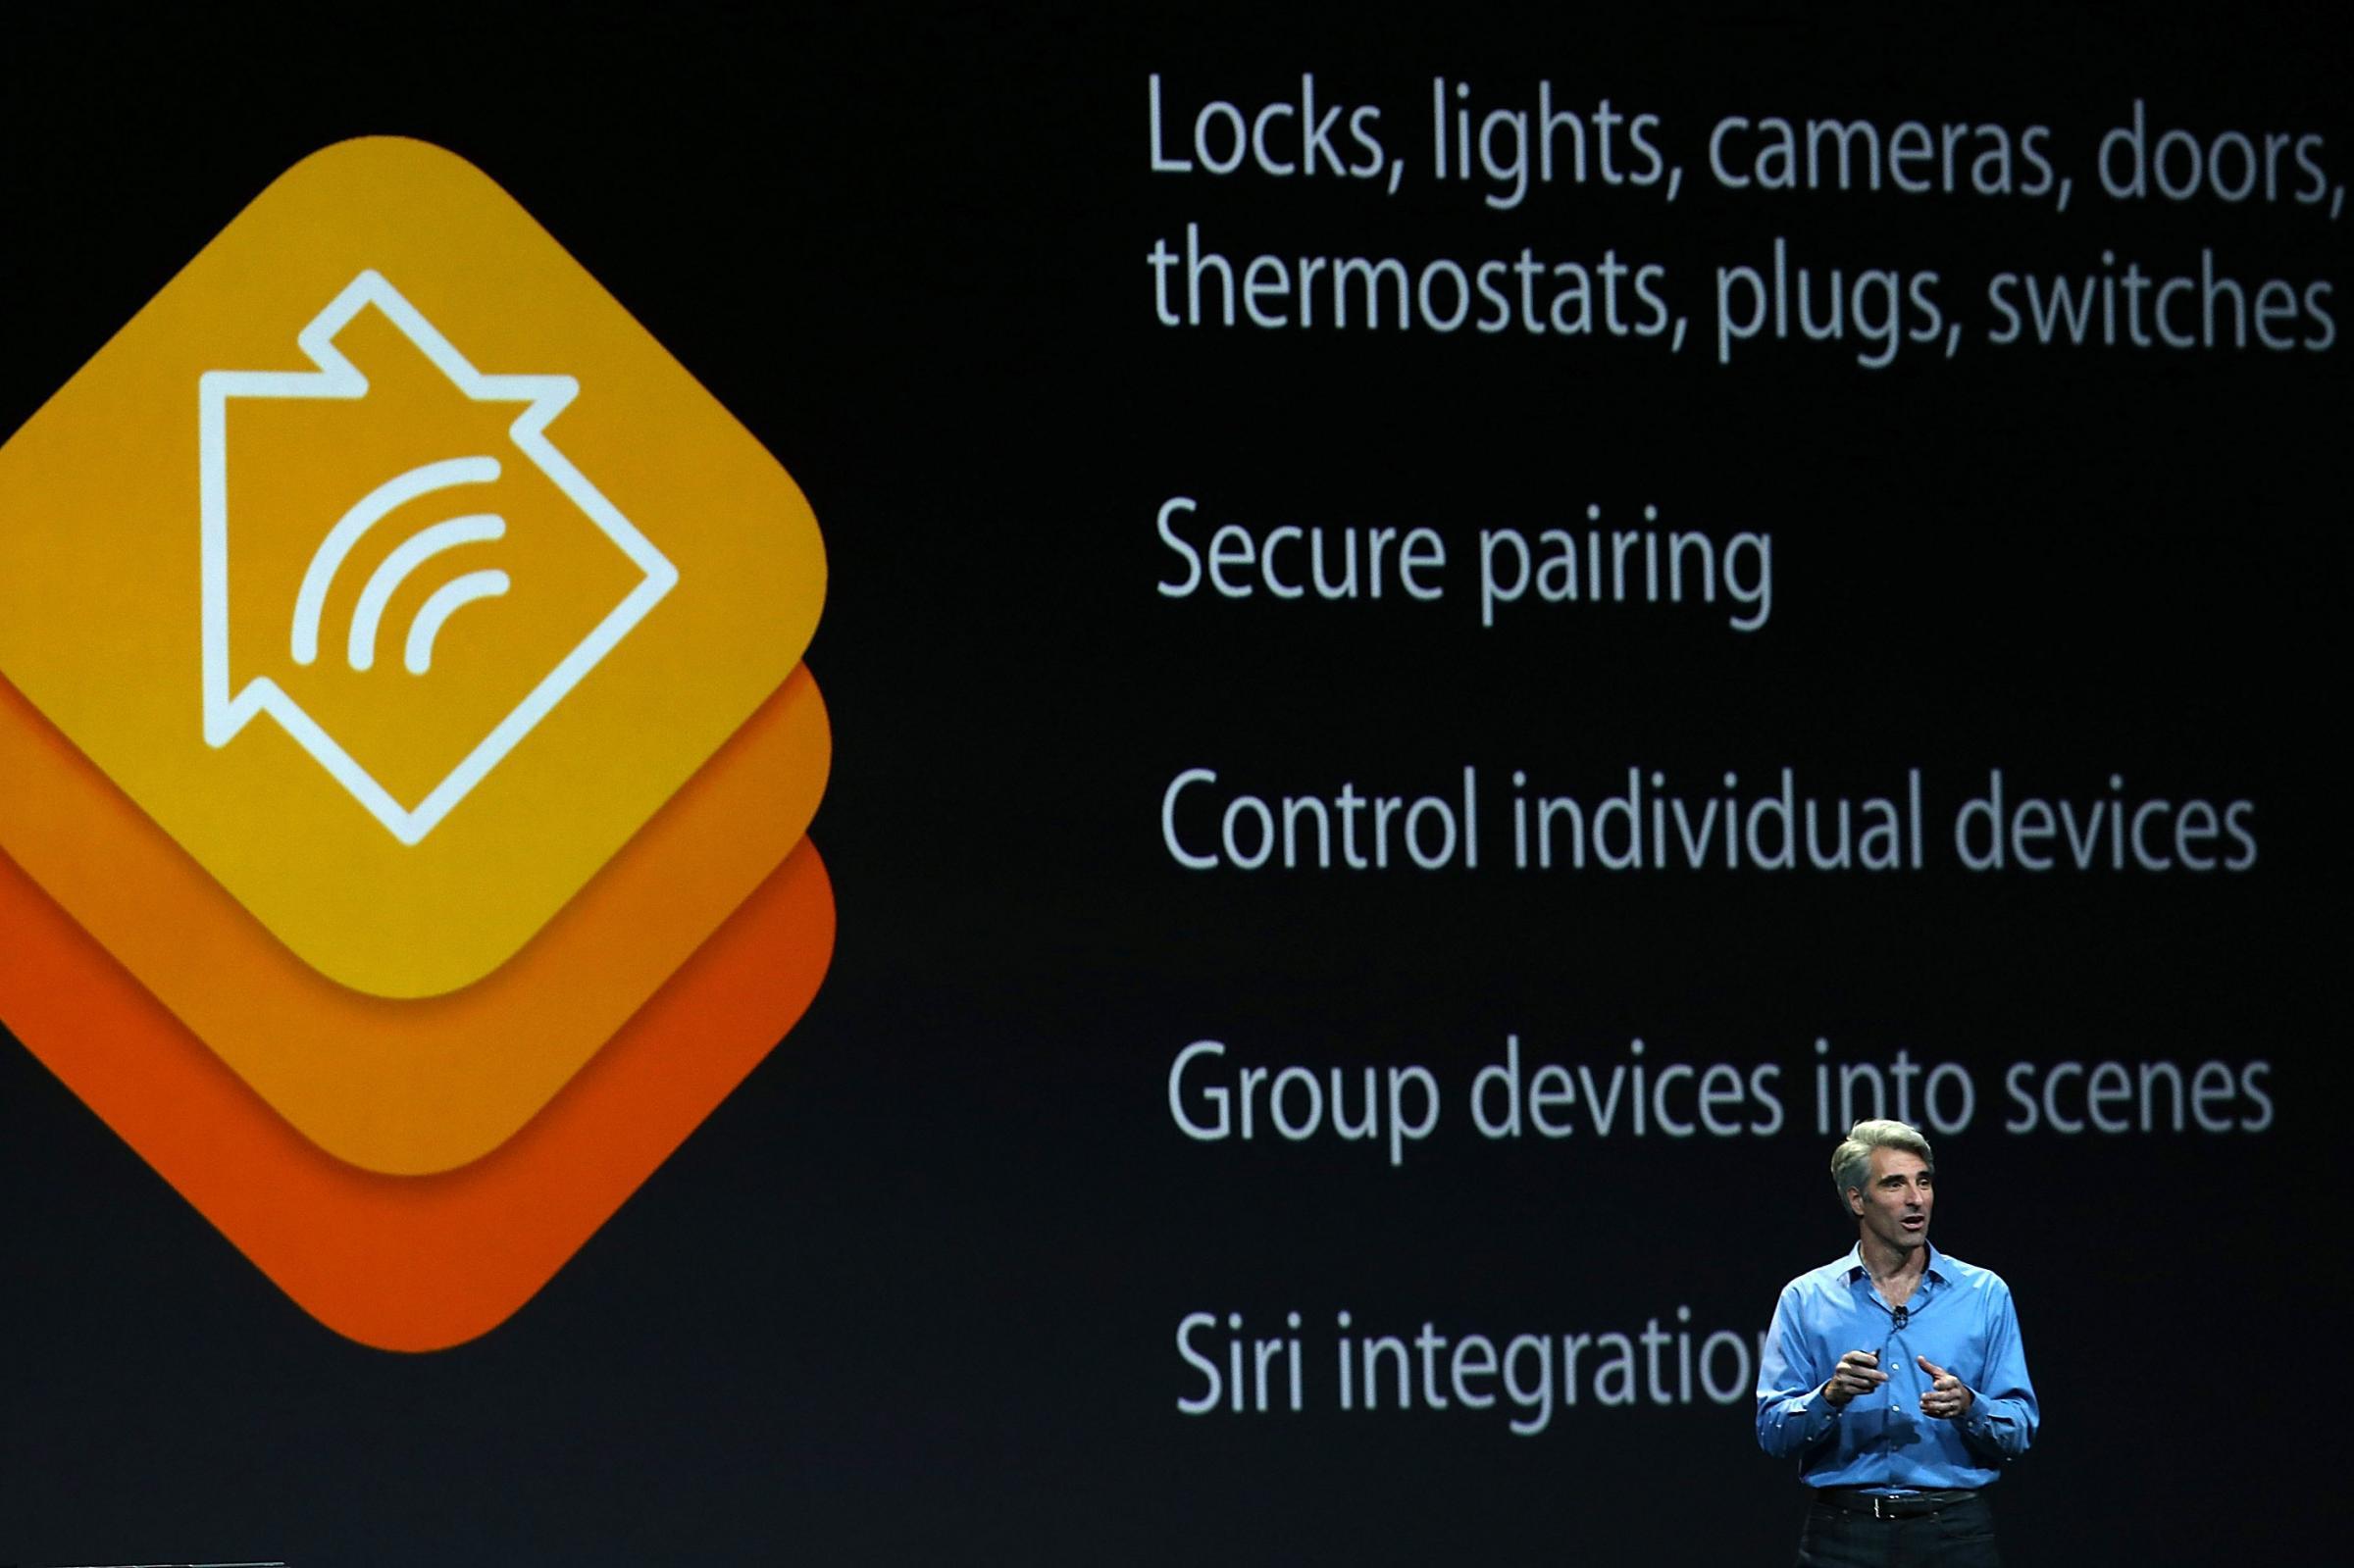 Apresentação do HomeKit na WWDC 2014